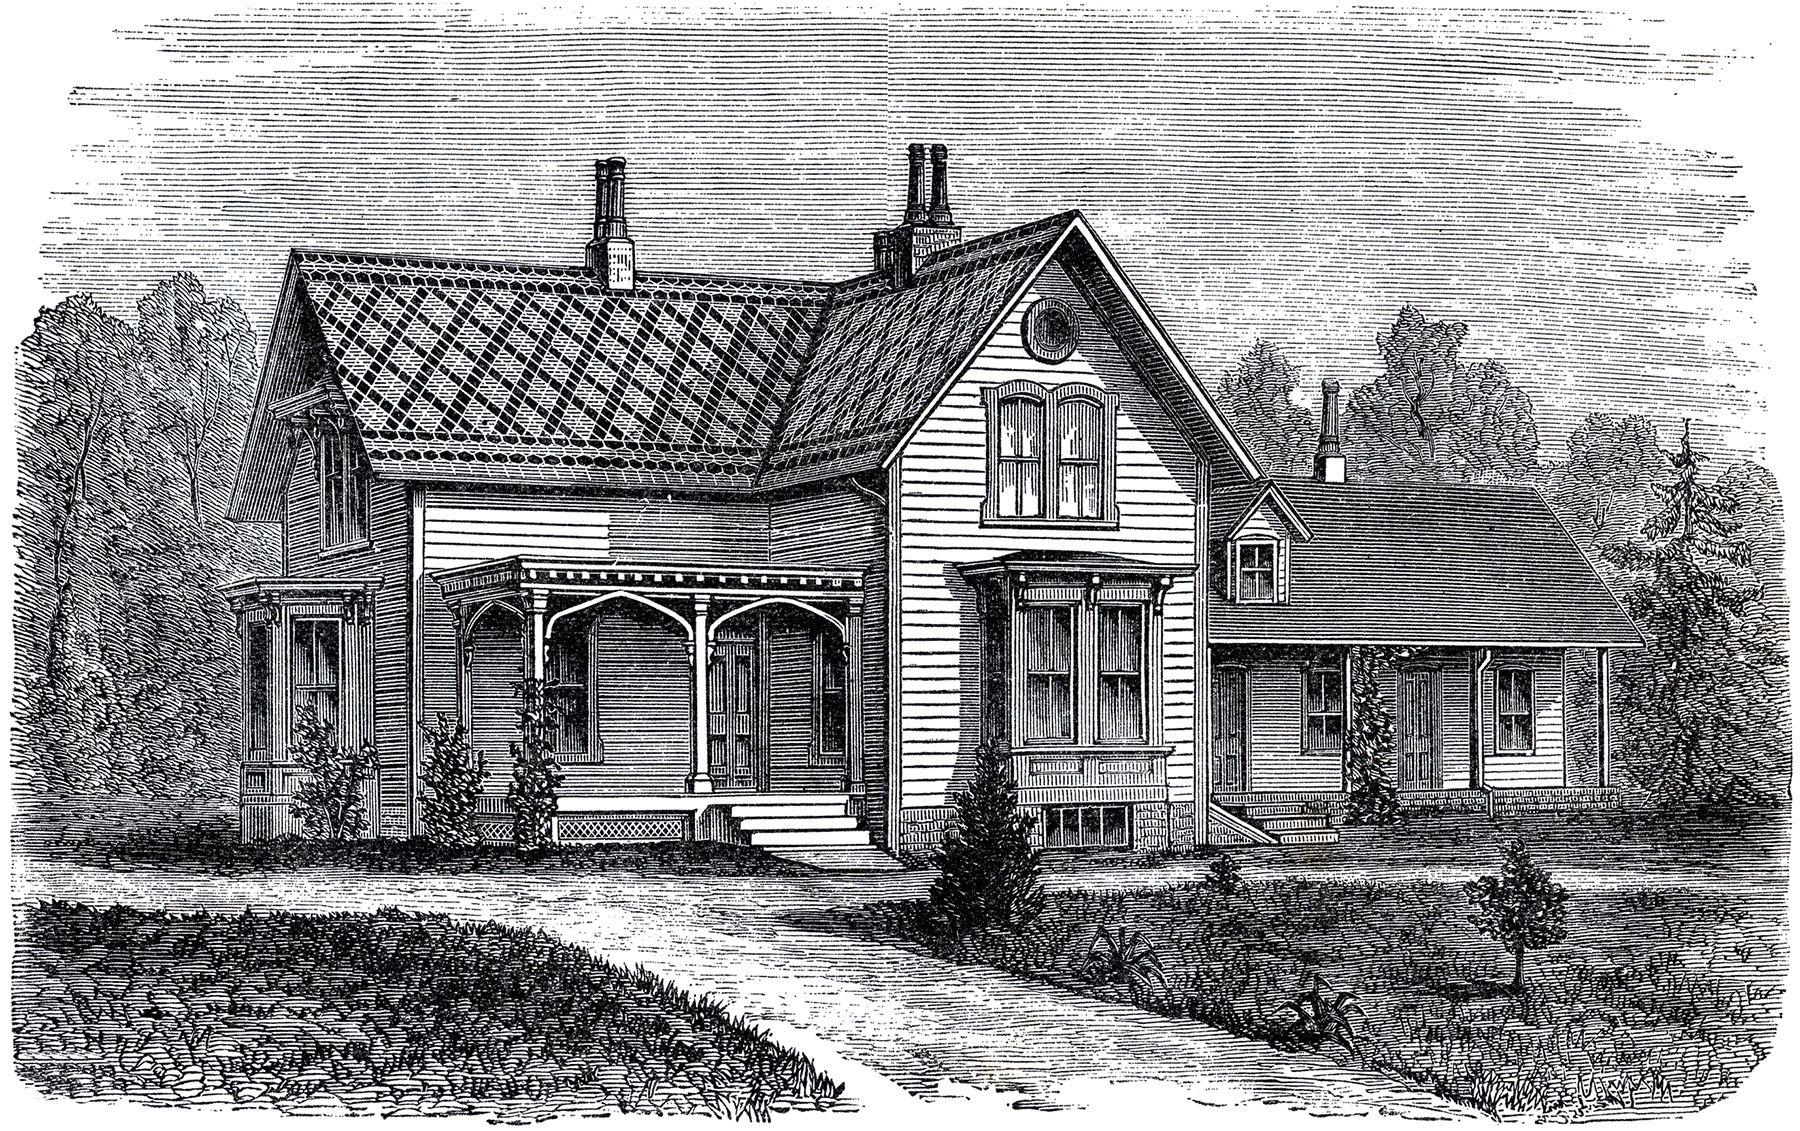 Lovely Vintage Farmhouse Image | Vintage farmhouse, Graphics fairy ... for Farmhouse Clipart Black And White  181obs